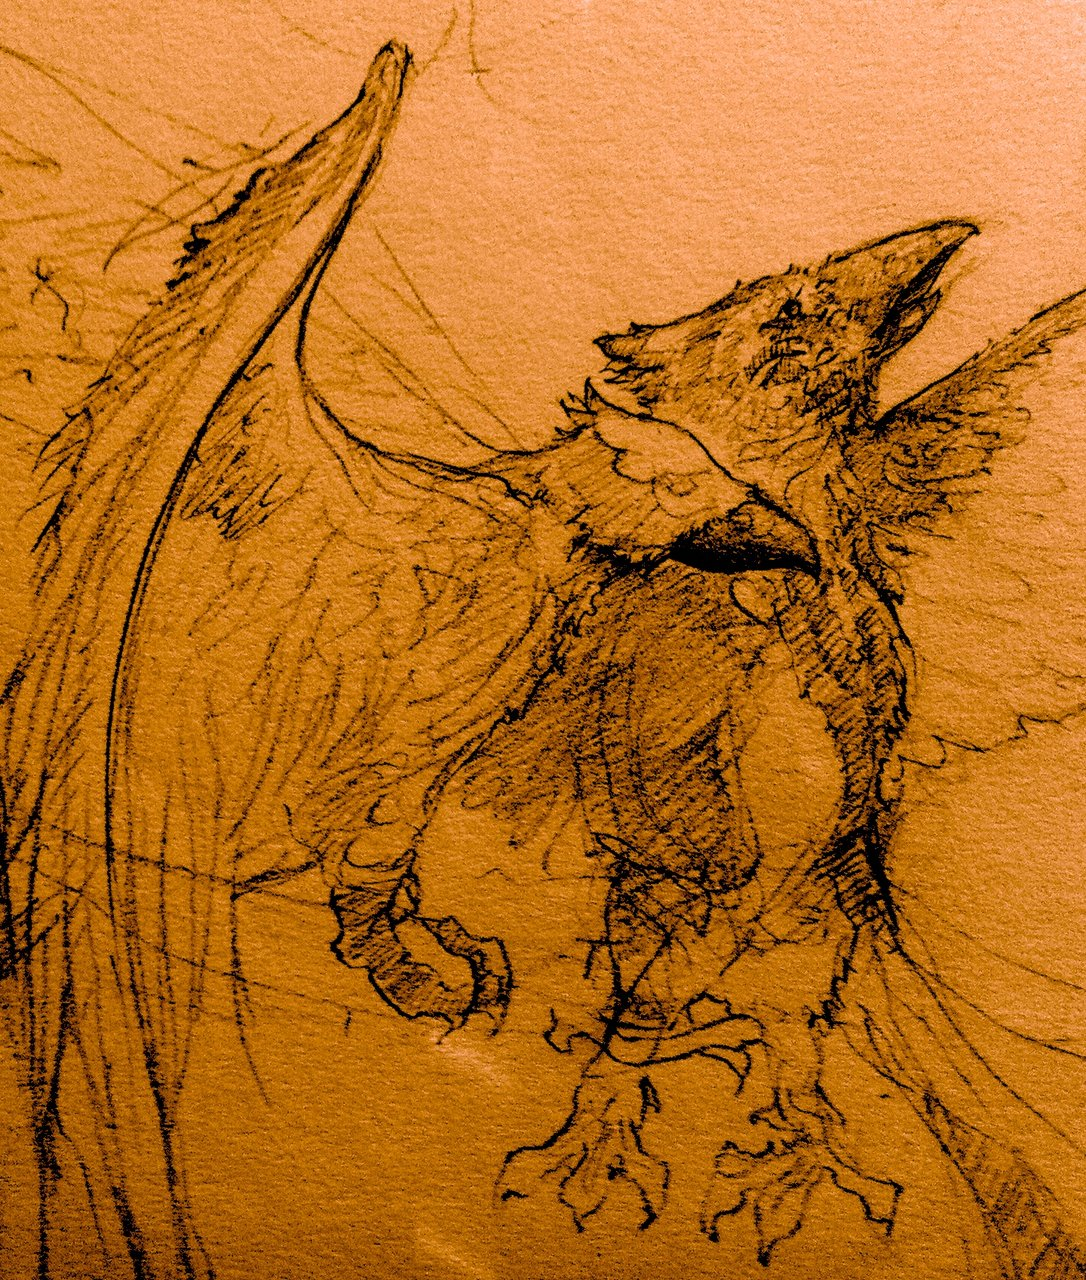 Raptors sketch